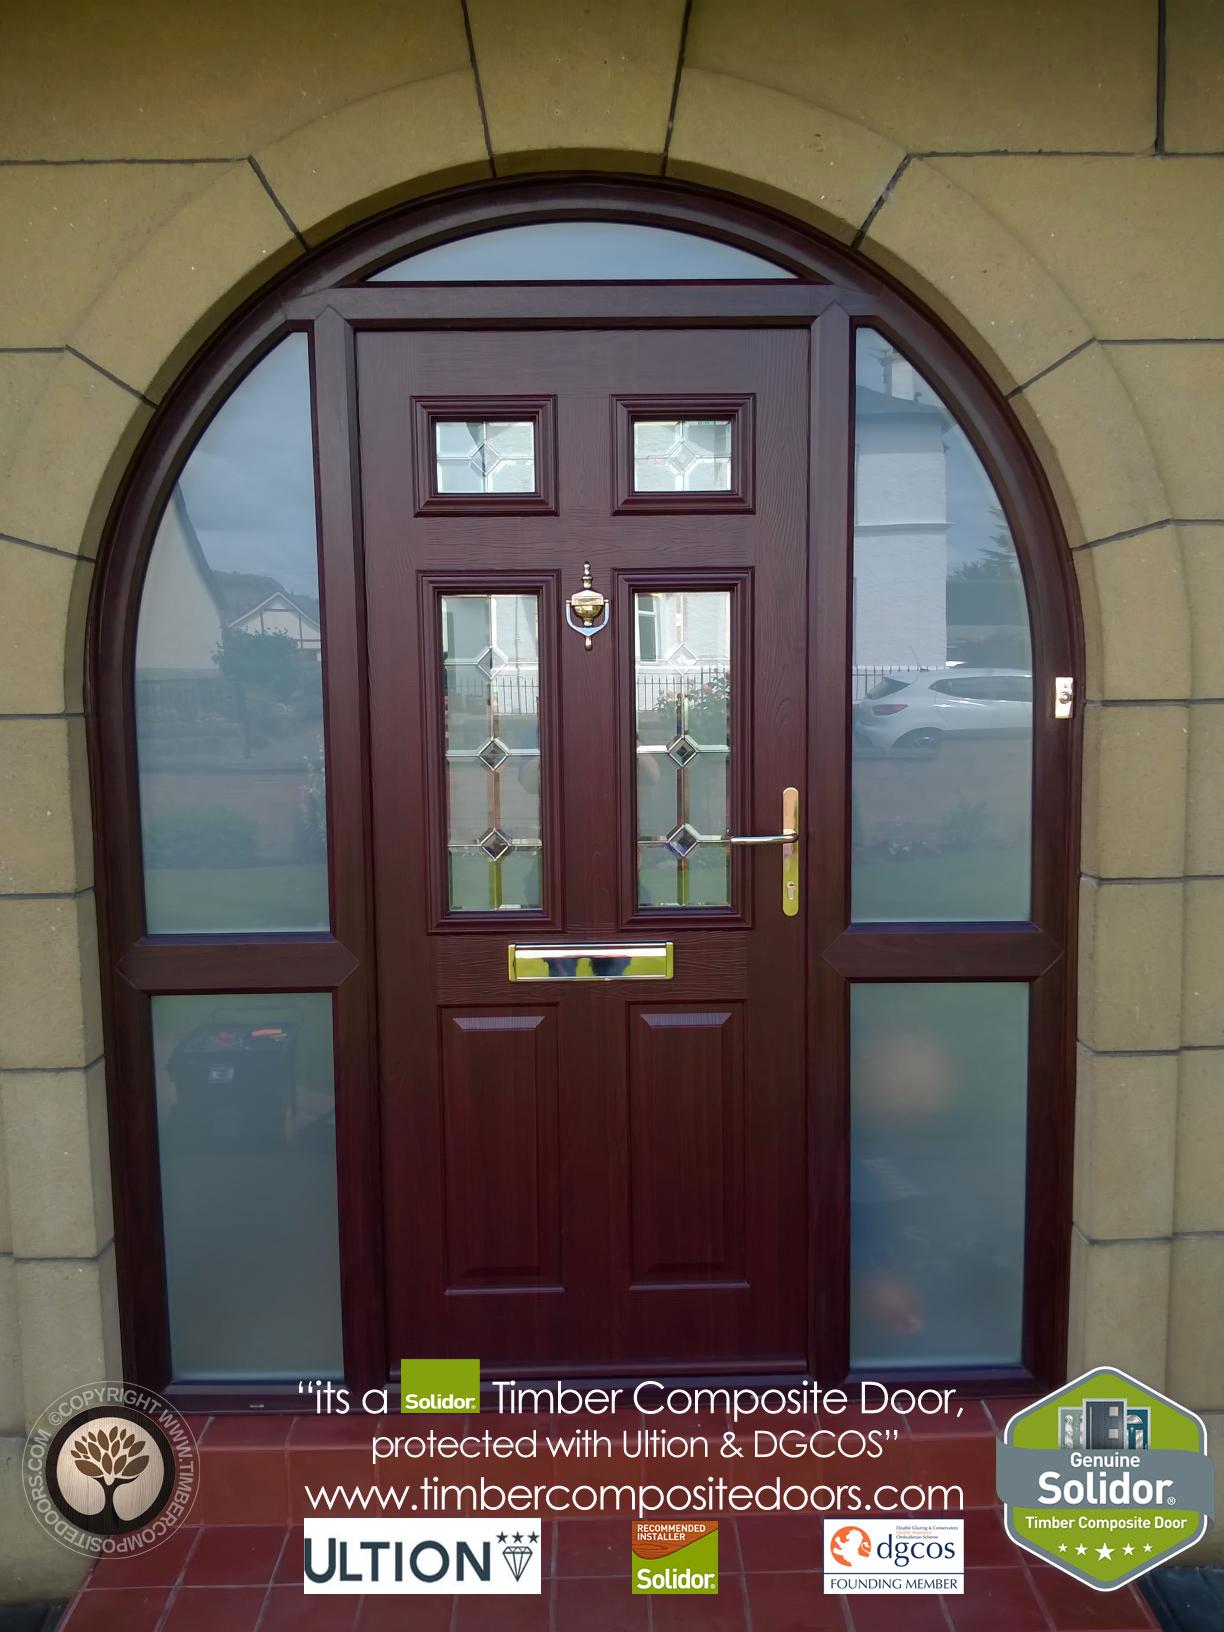 Arched-Composite-Solidor-Timber-Composite-Door